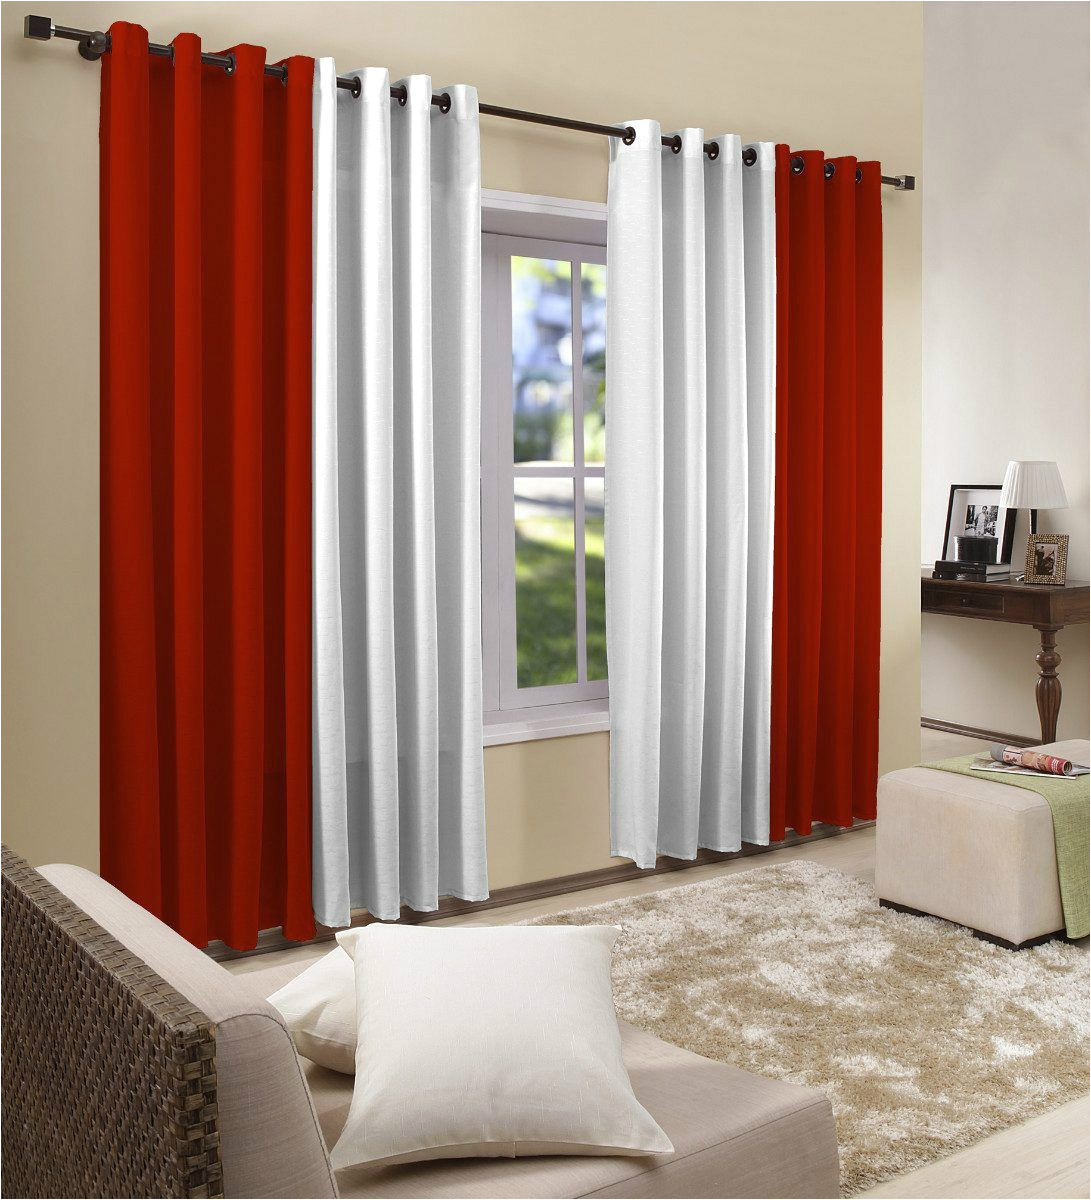 mejores 102 imagenes de cortina en pinterest curtains home y make curtains